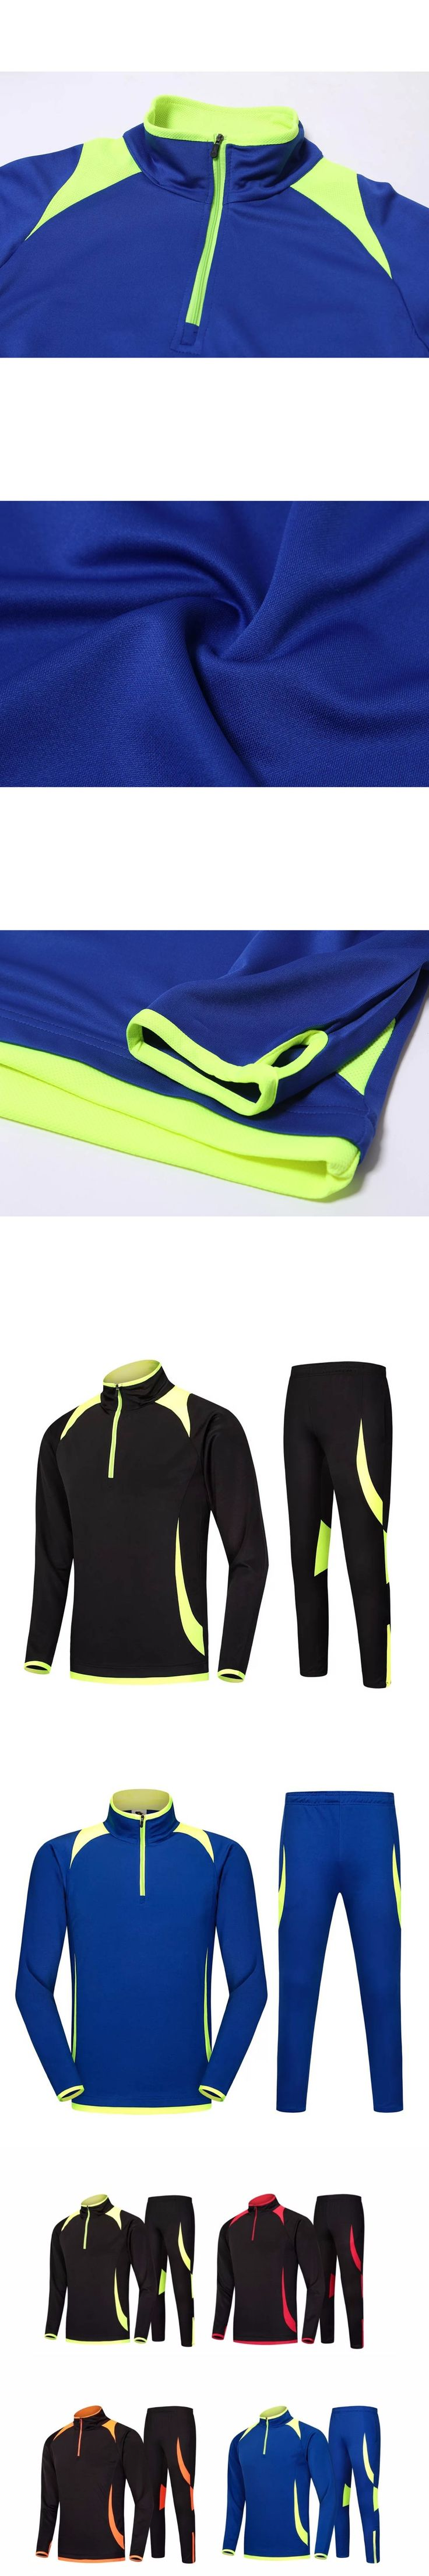 2016 Survetement football tracksuit sport training suit kits Soccer Chandal training shinny pants sweatershirt GY6501+GY6601